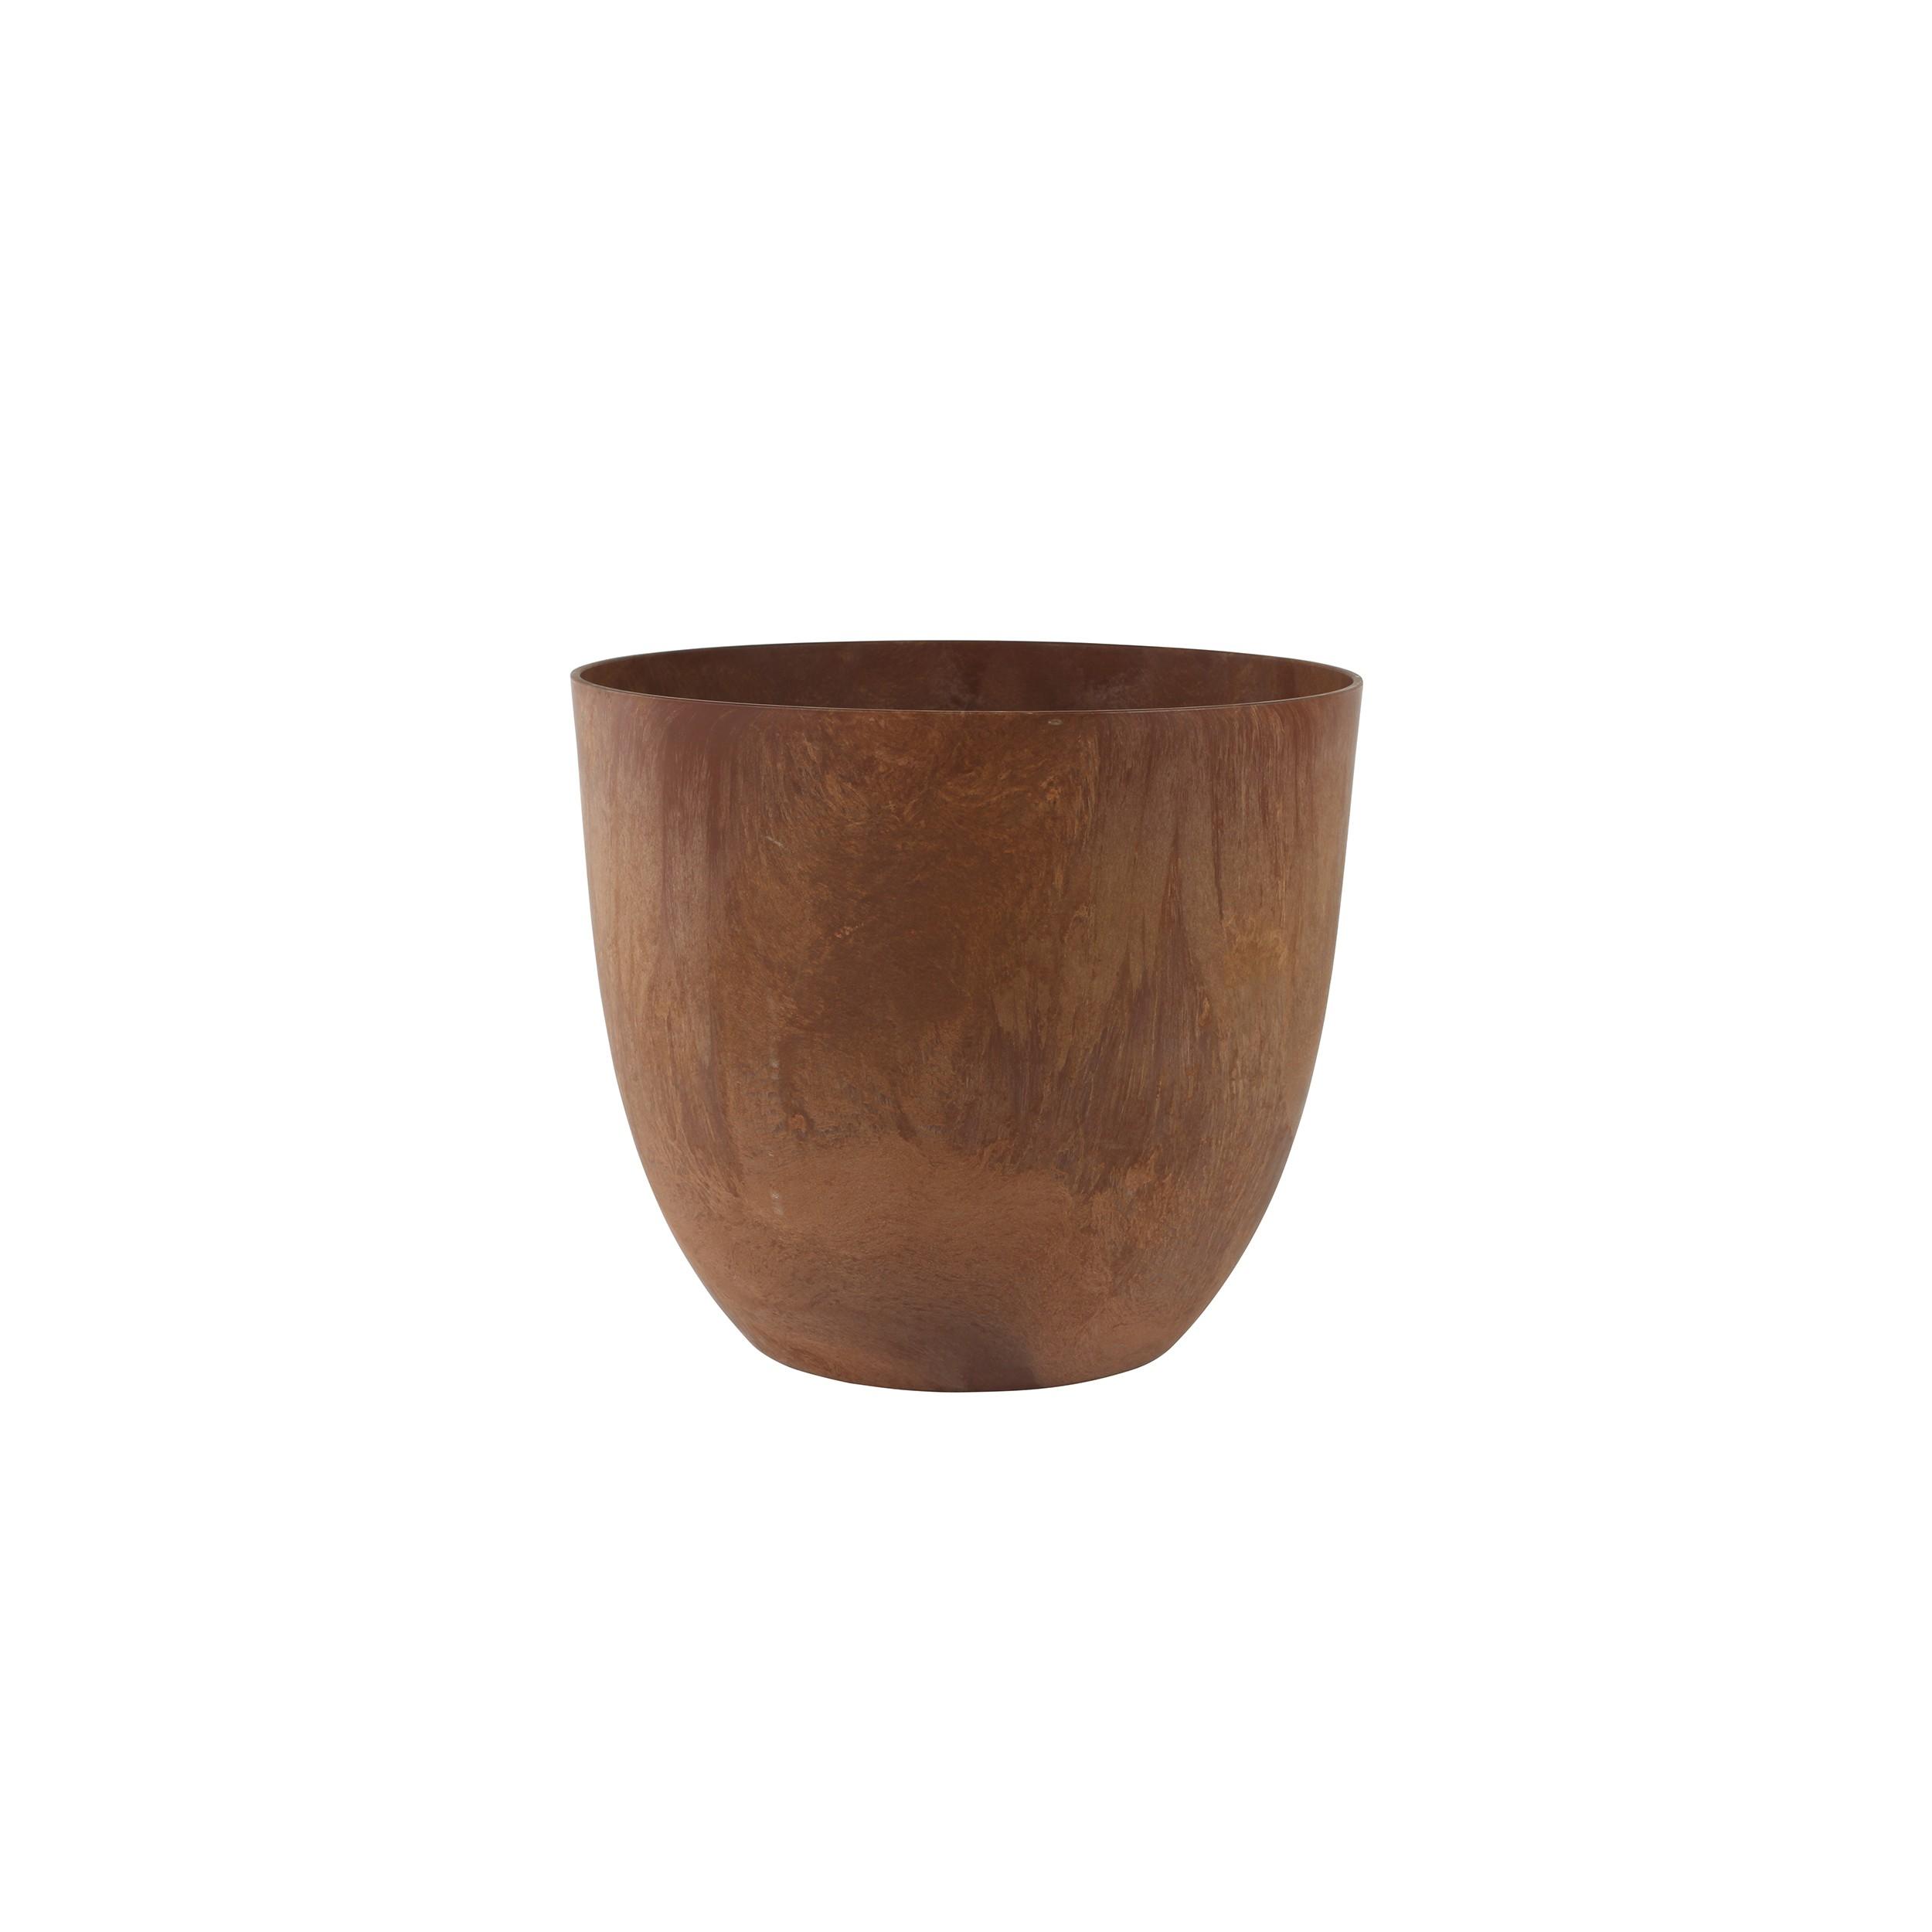 Artstone Blumentopf Bola D38 cm Durchmesser 38 cm